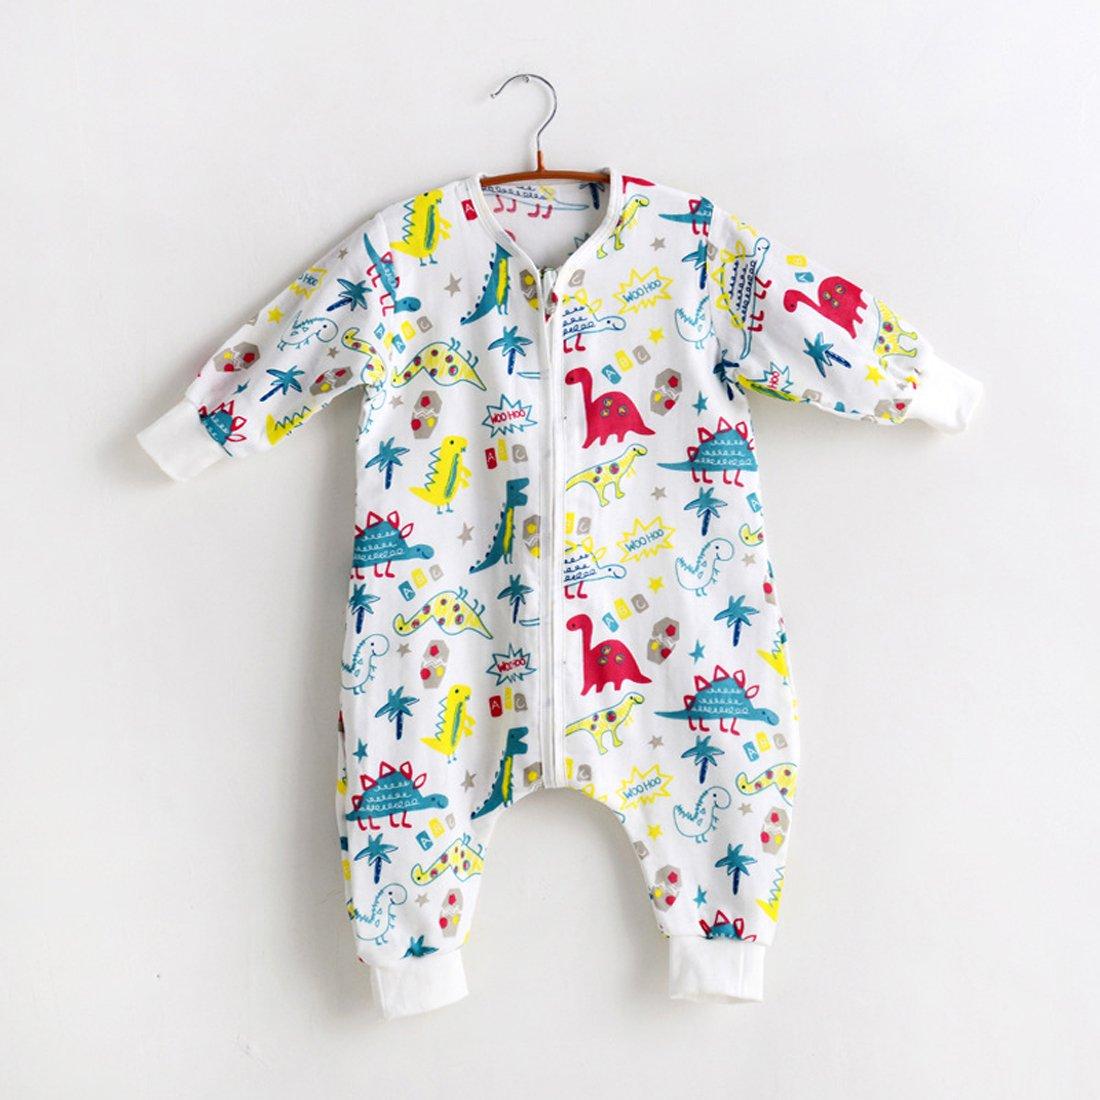 Baby Cotton Sleep Bag with Feet Walker Sleep Bag Or Sack, Also as Anti-Kicking Sleeping Bag,(M Dinosaur,0-12 Months)